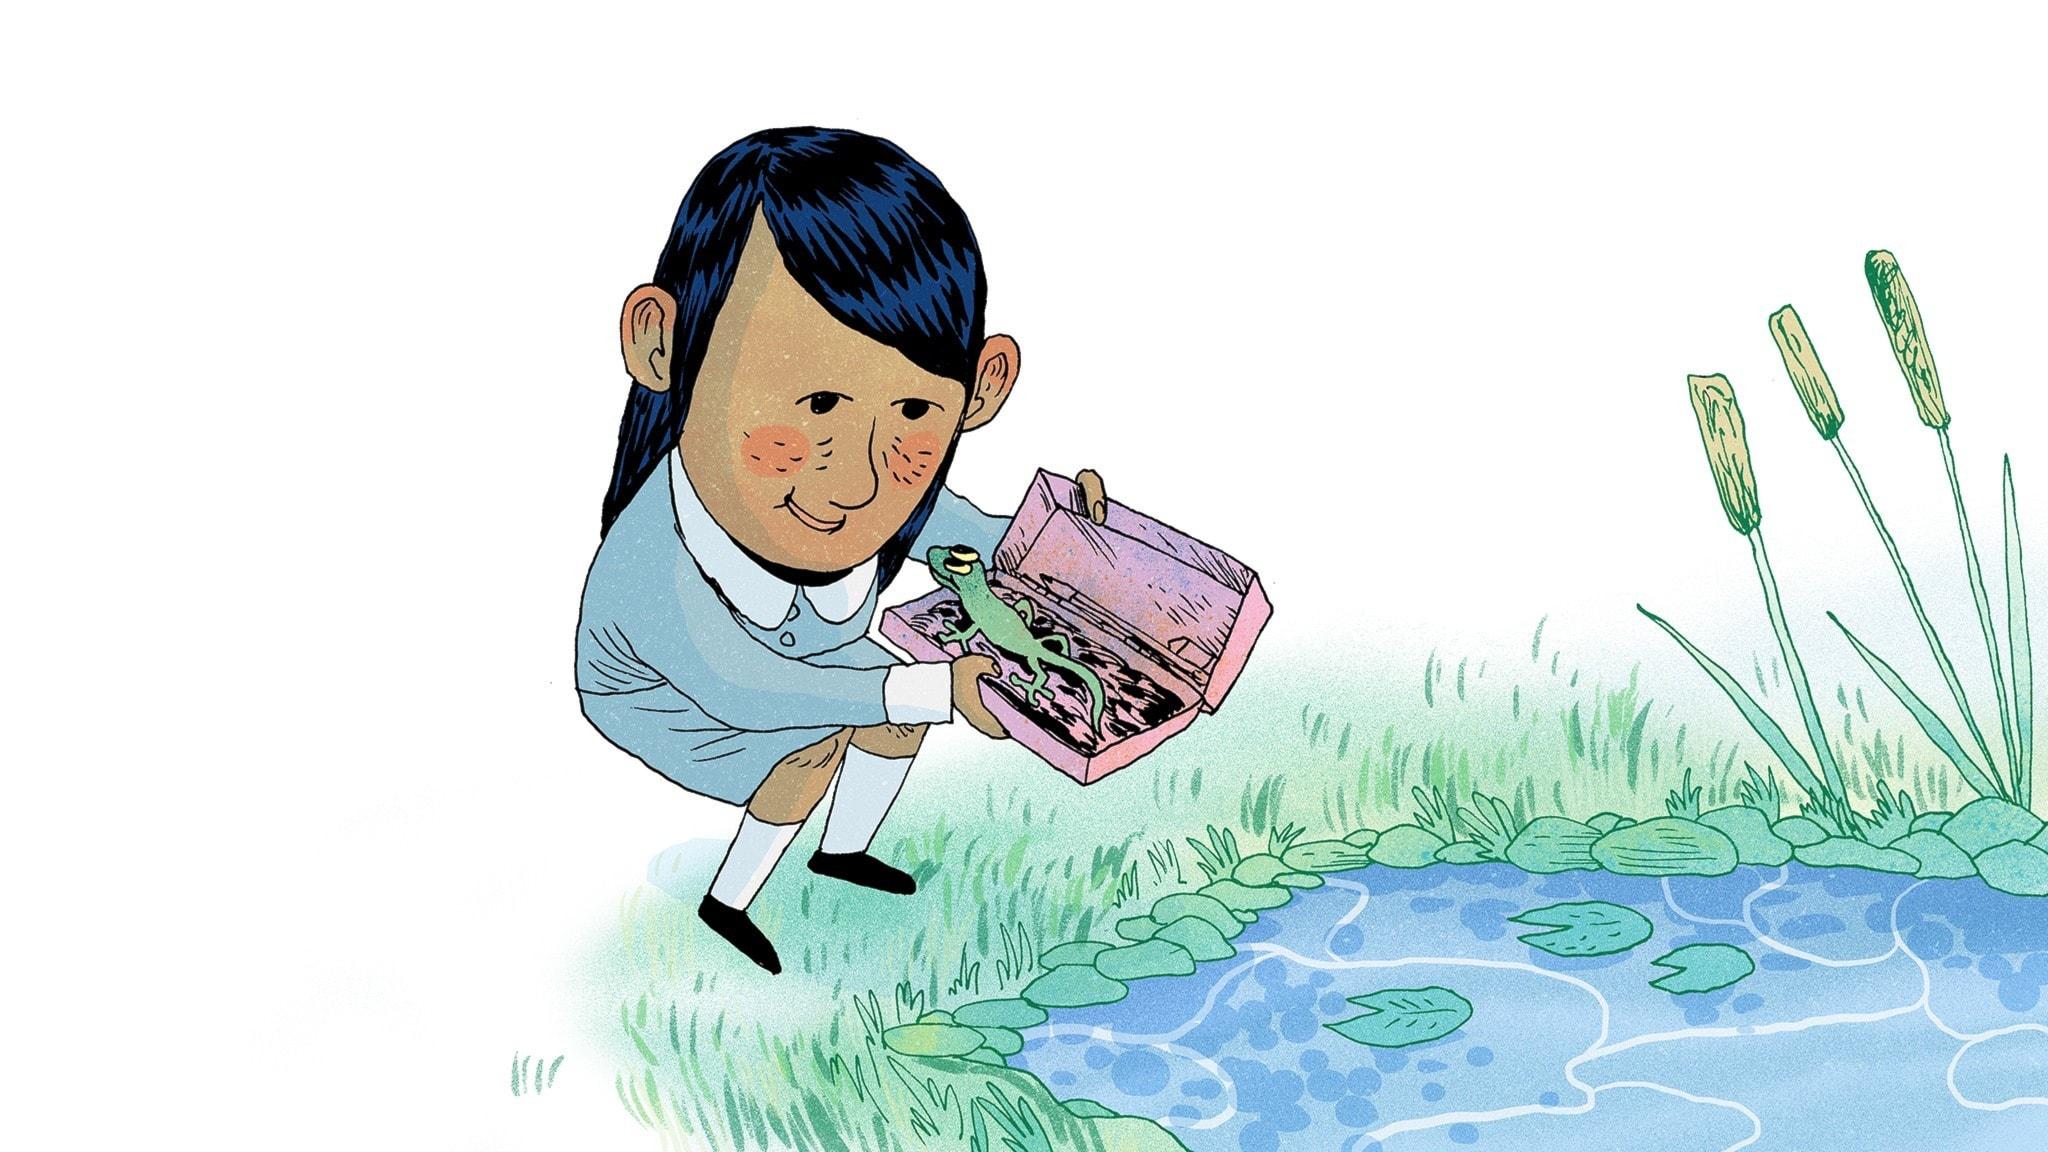 Matildas kompis Lavendel fångar en vattenödla. Bild: Erik Svetoft